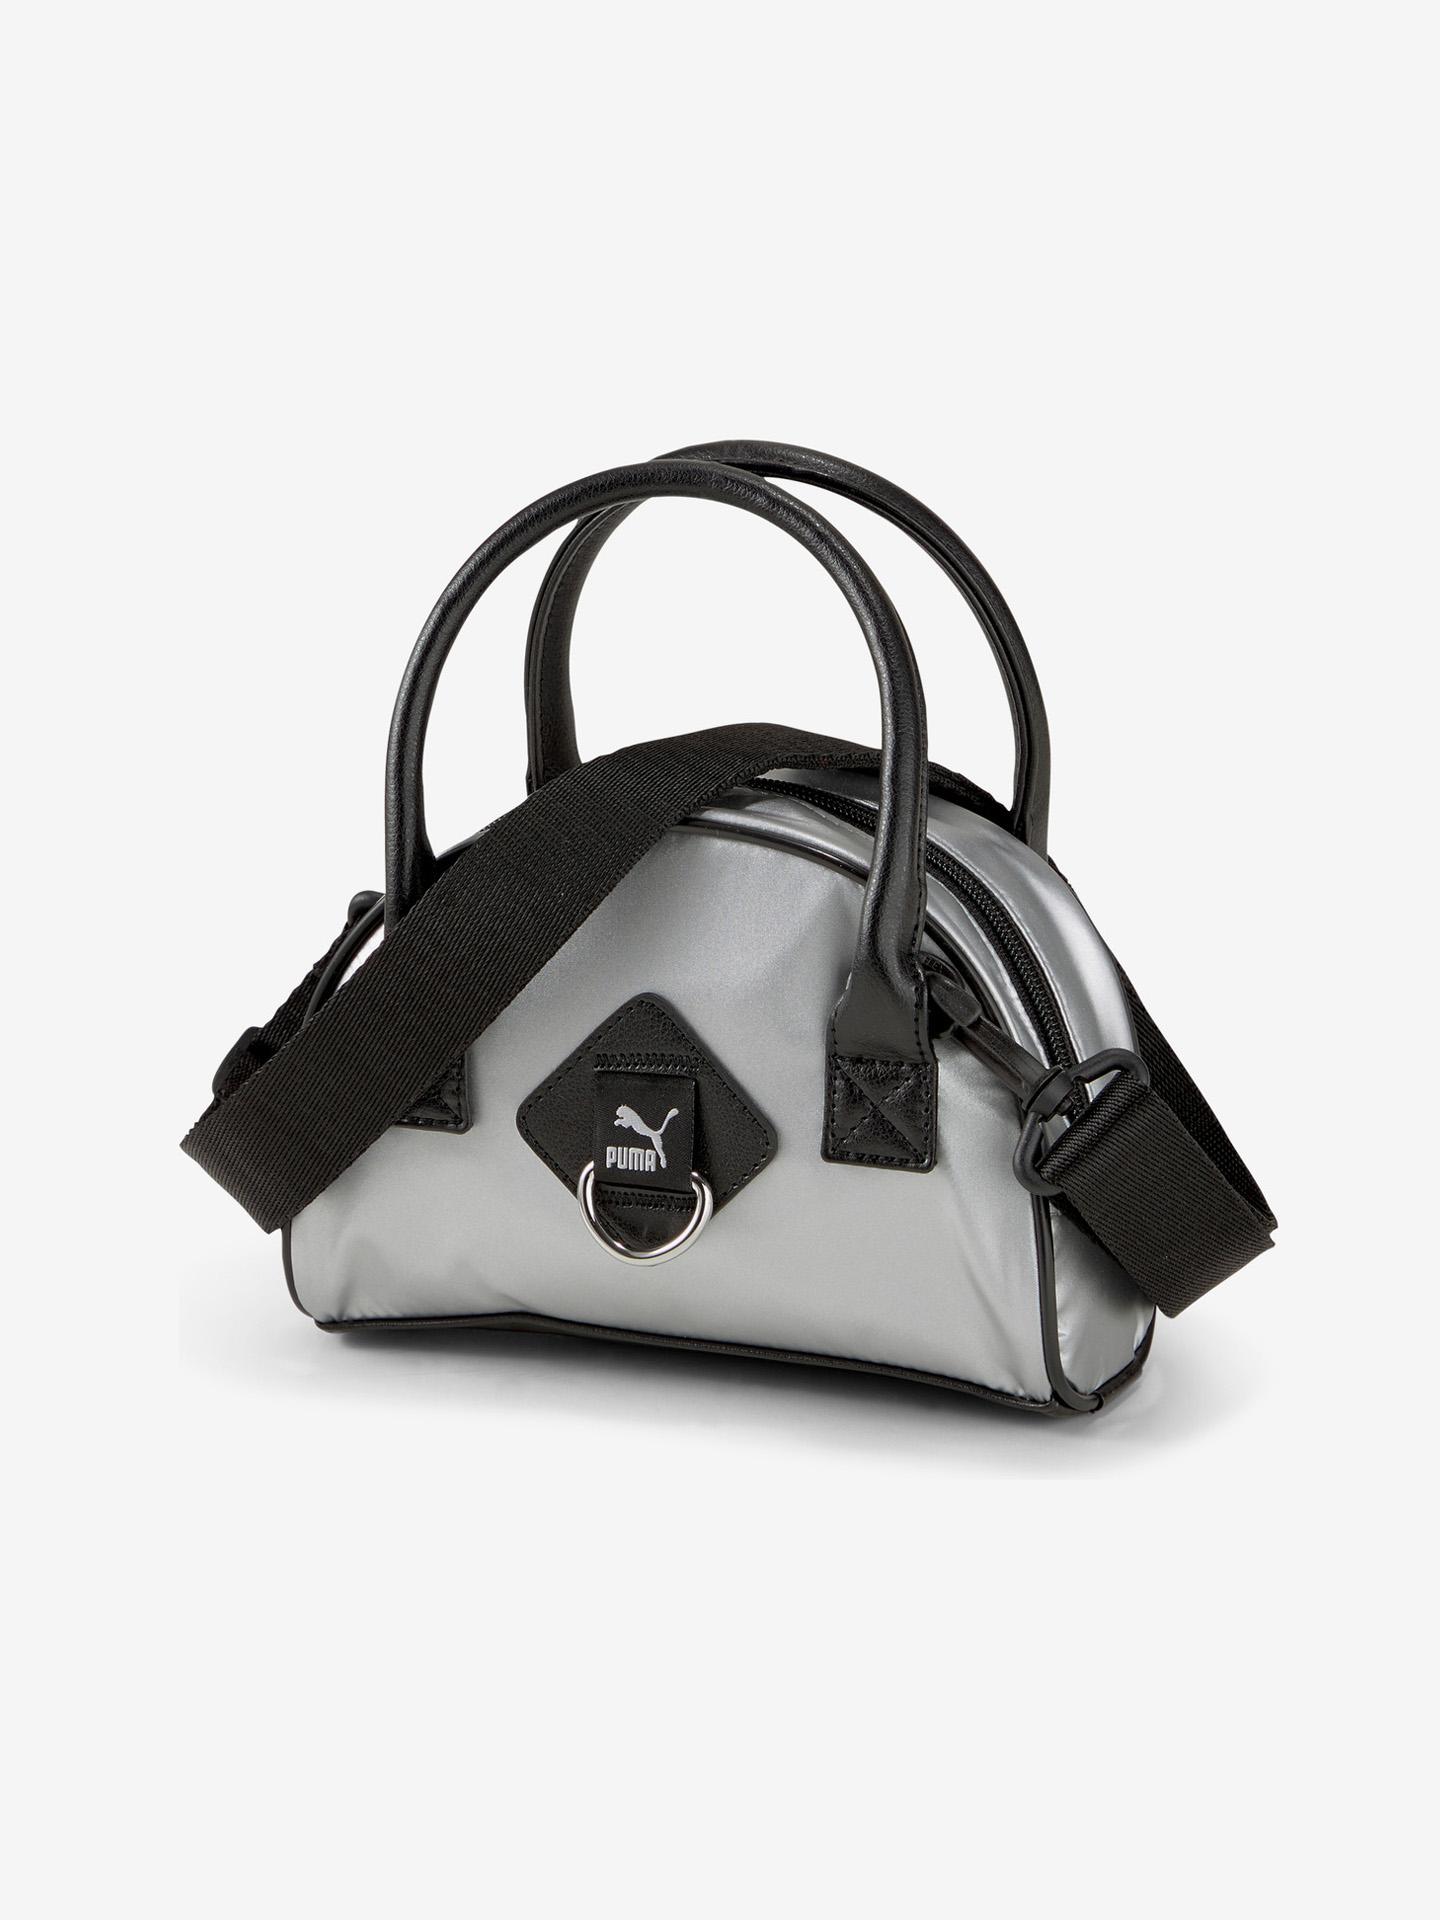 Puma сребърна дамска чанта Prime Time Mini Grip